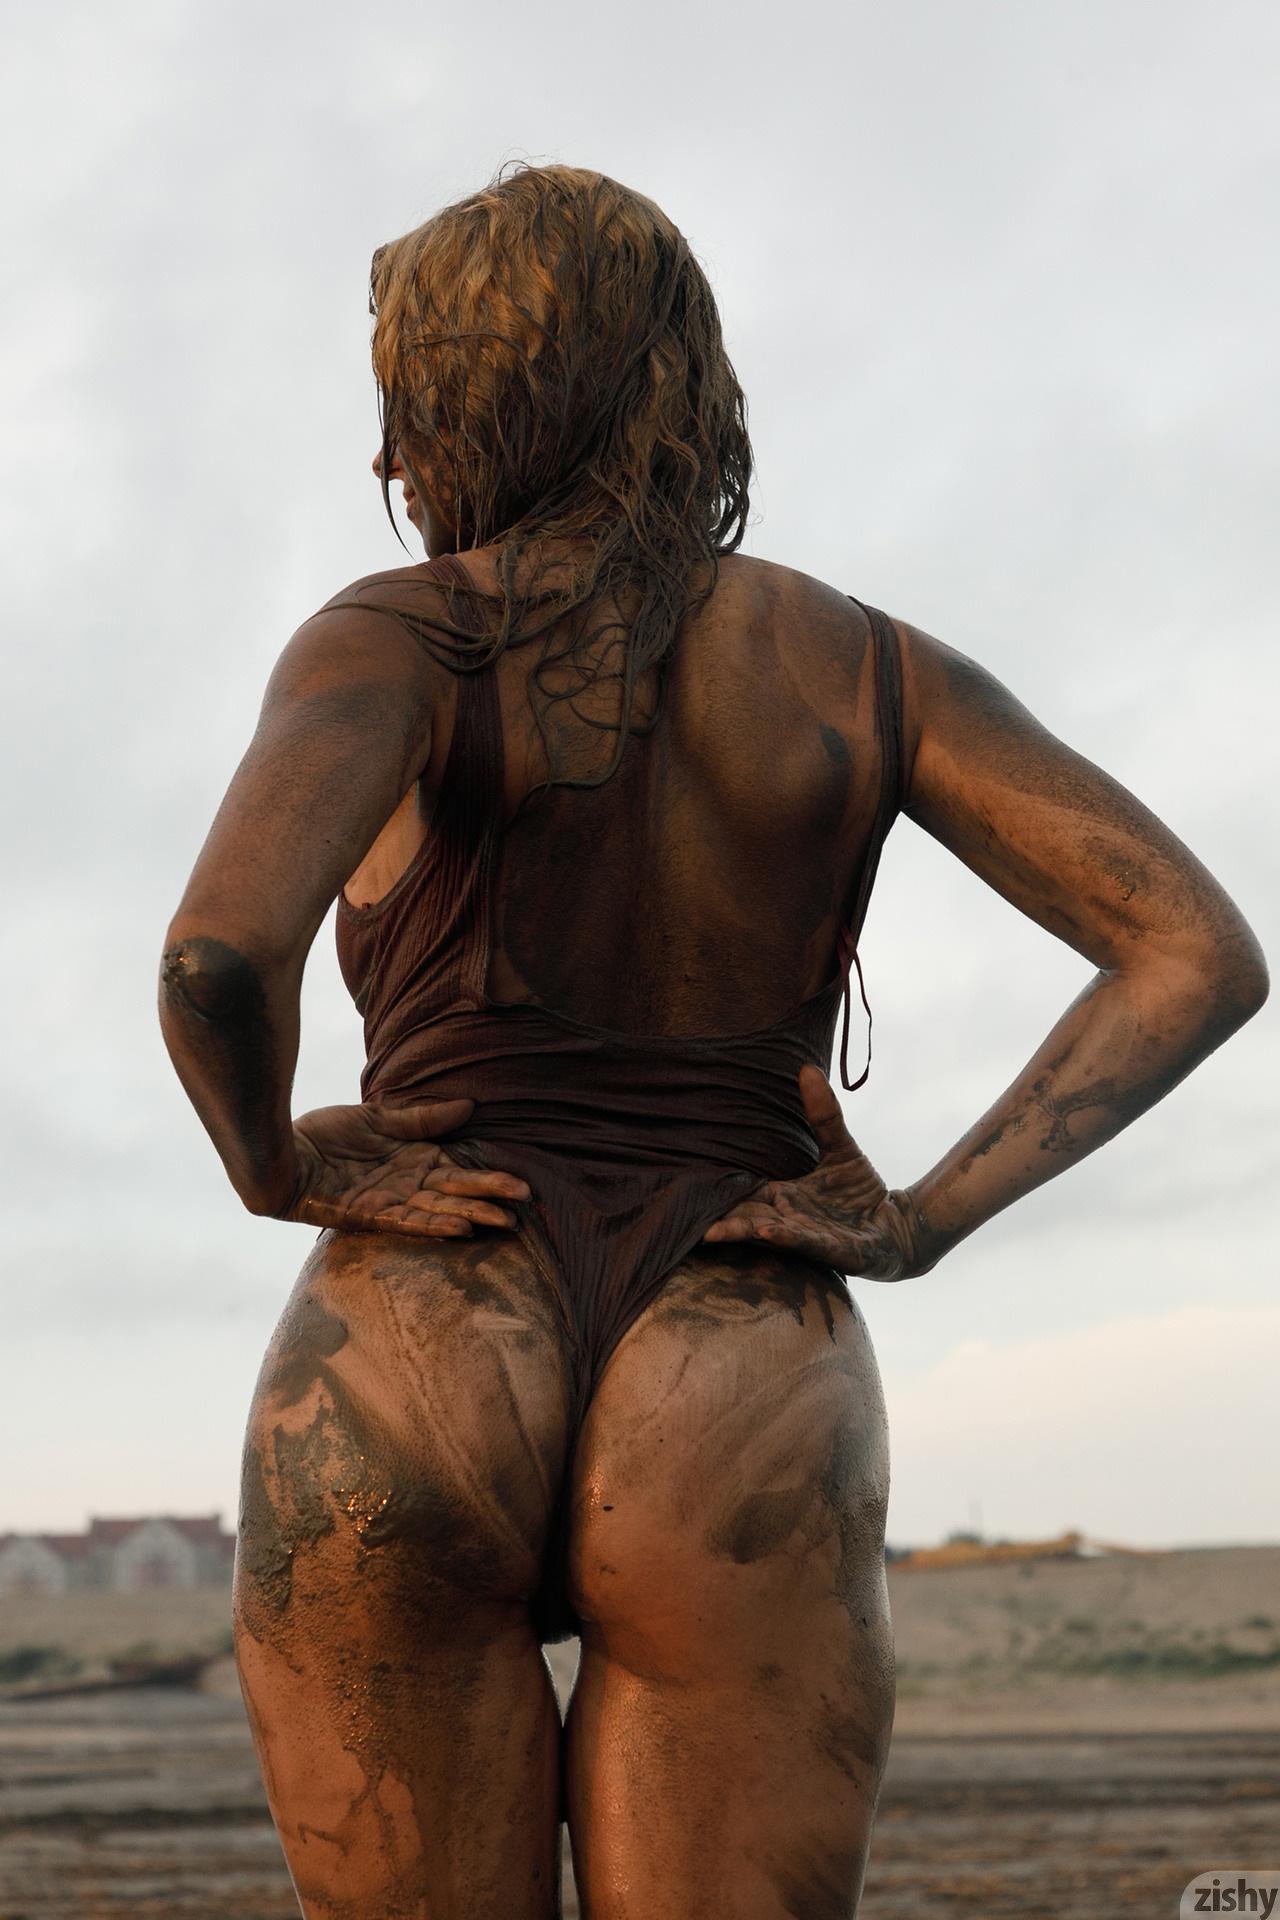 Sofia Orlova On Gryaznyy Beach Zishy (69)